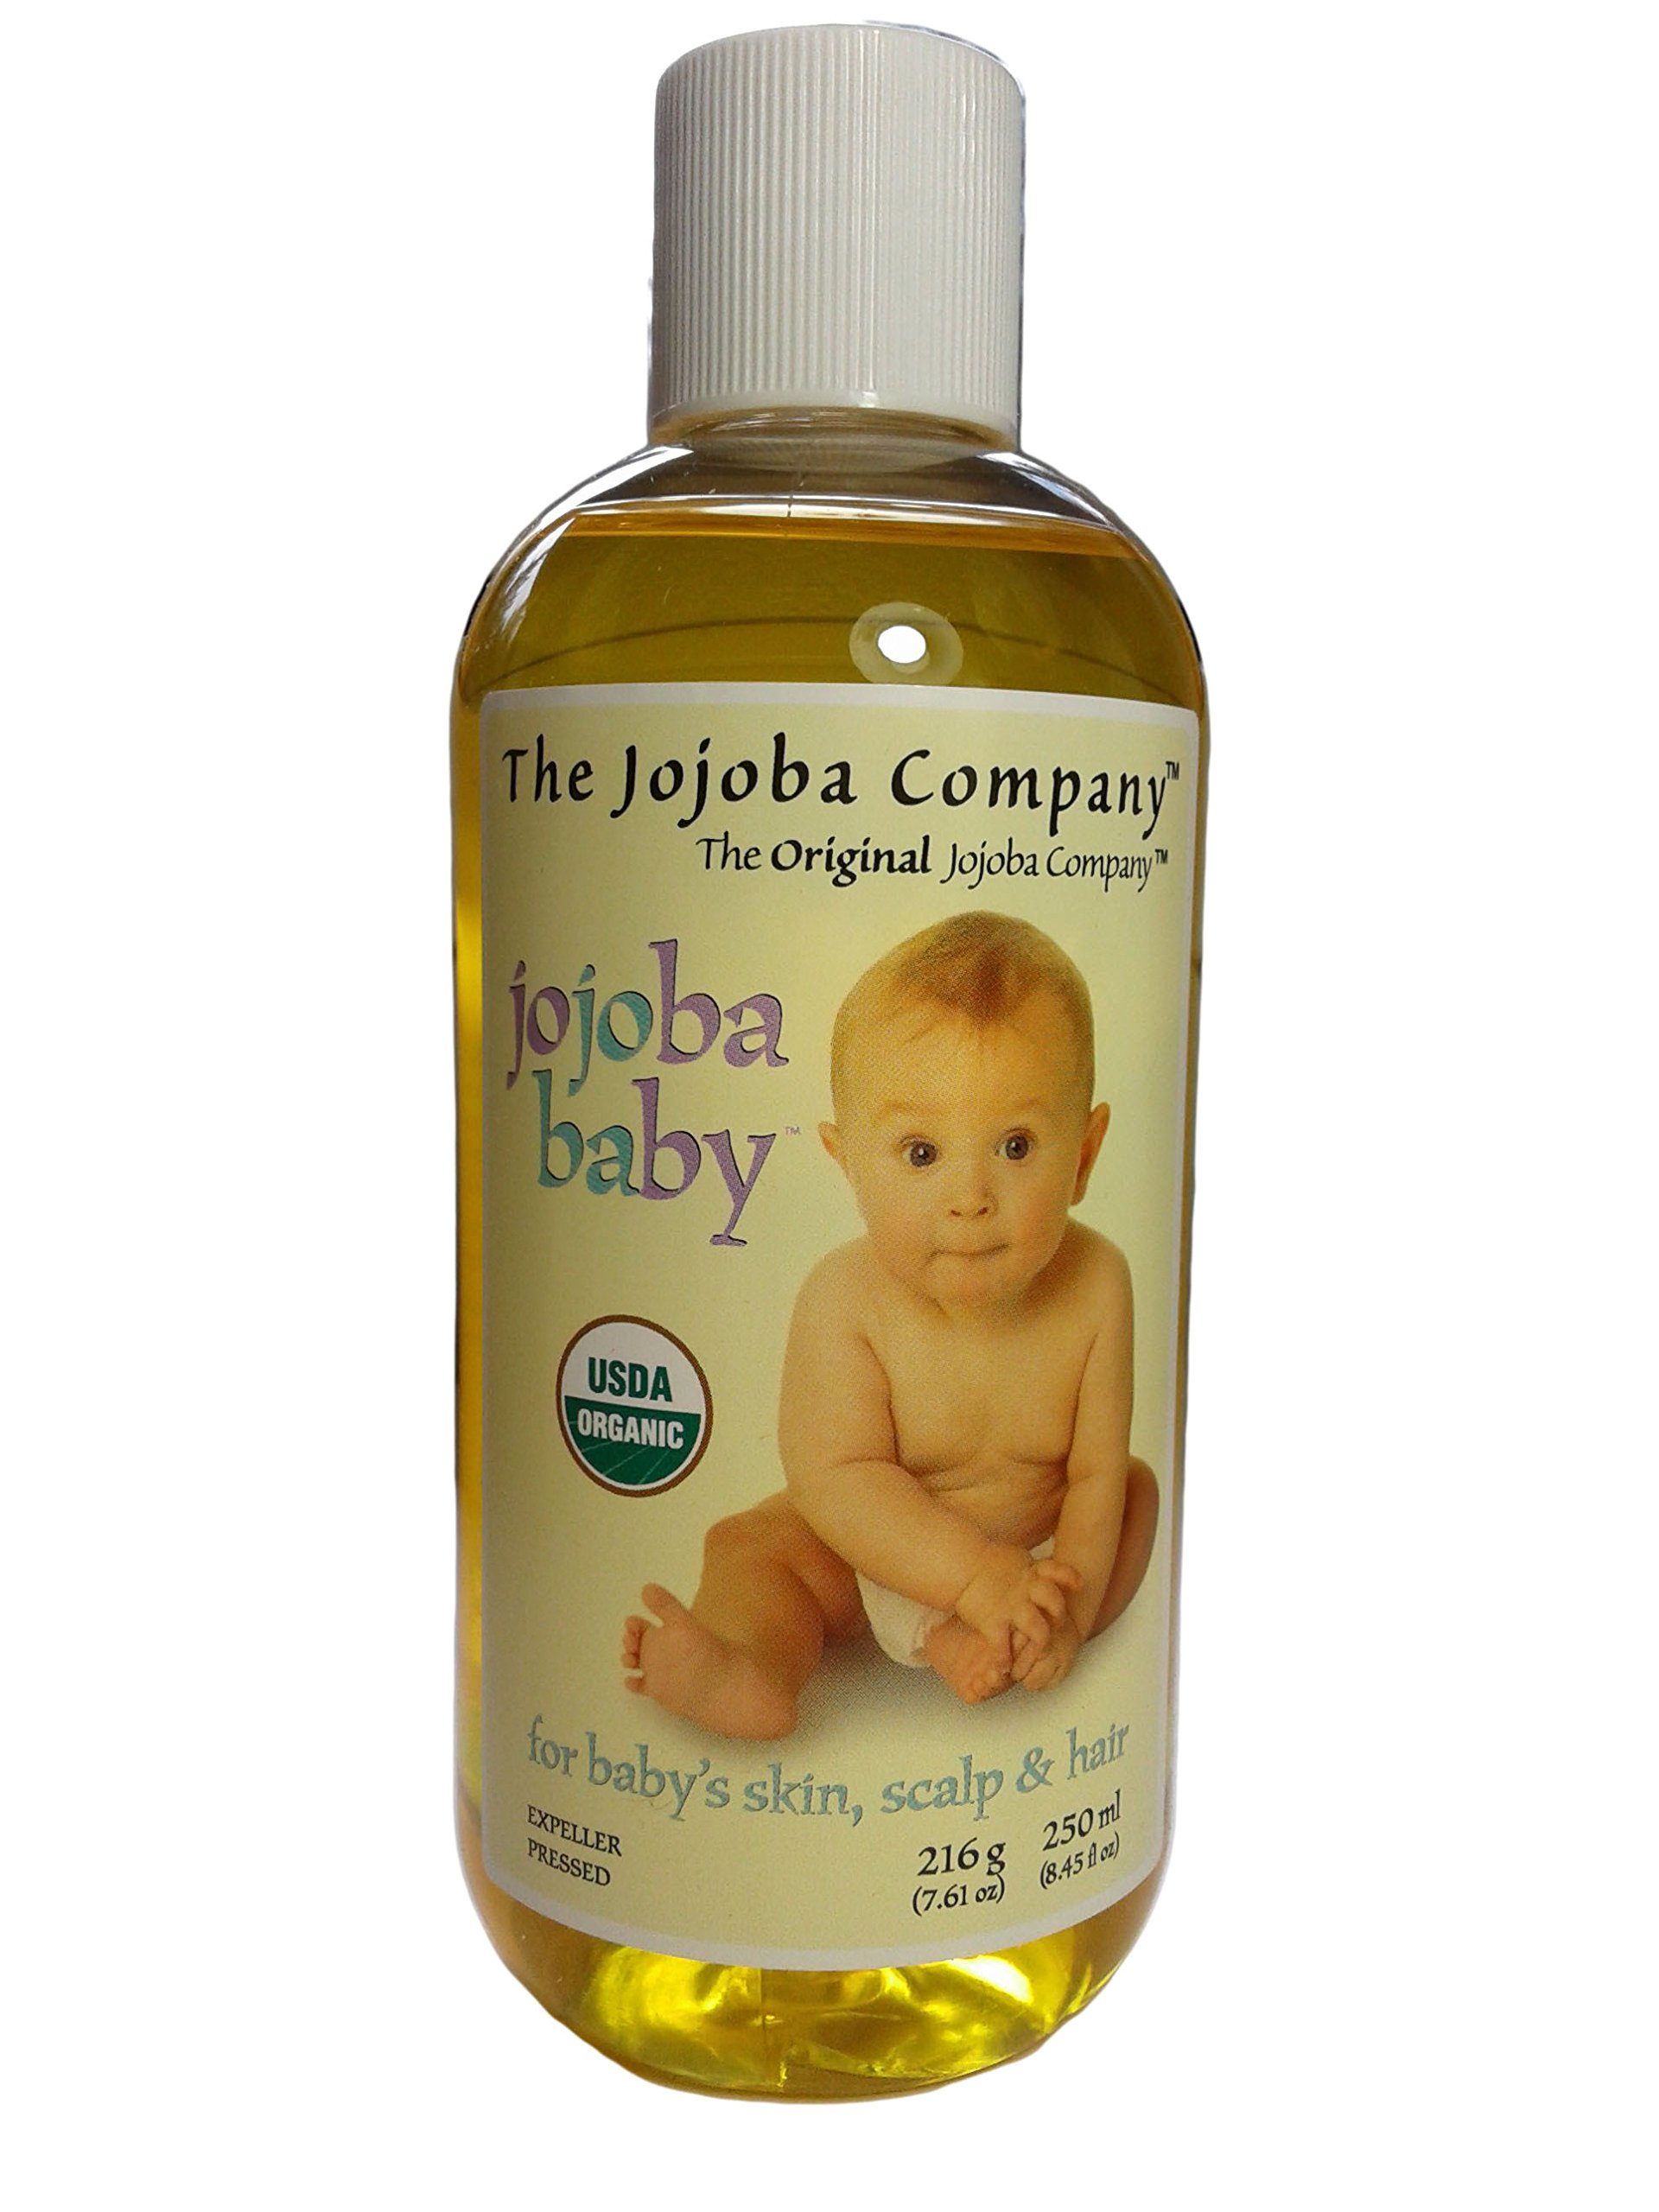 250ml USDA Certified 100% Organic Jojoba Baby from The Jojoba Company